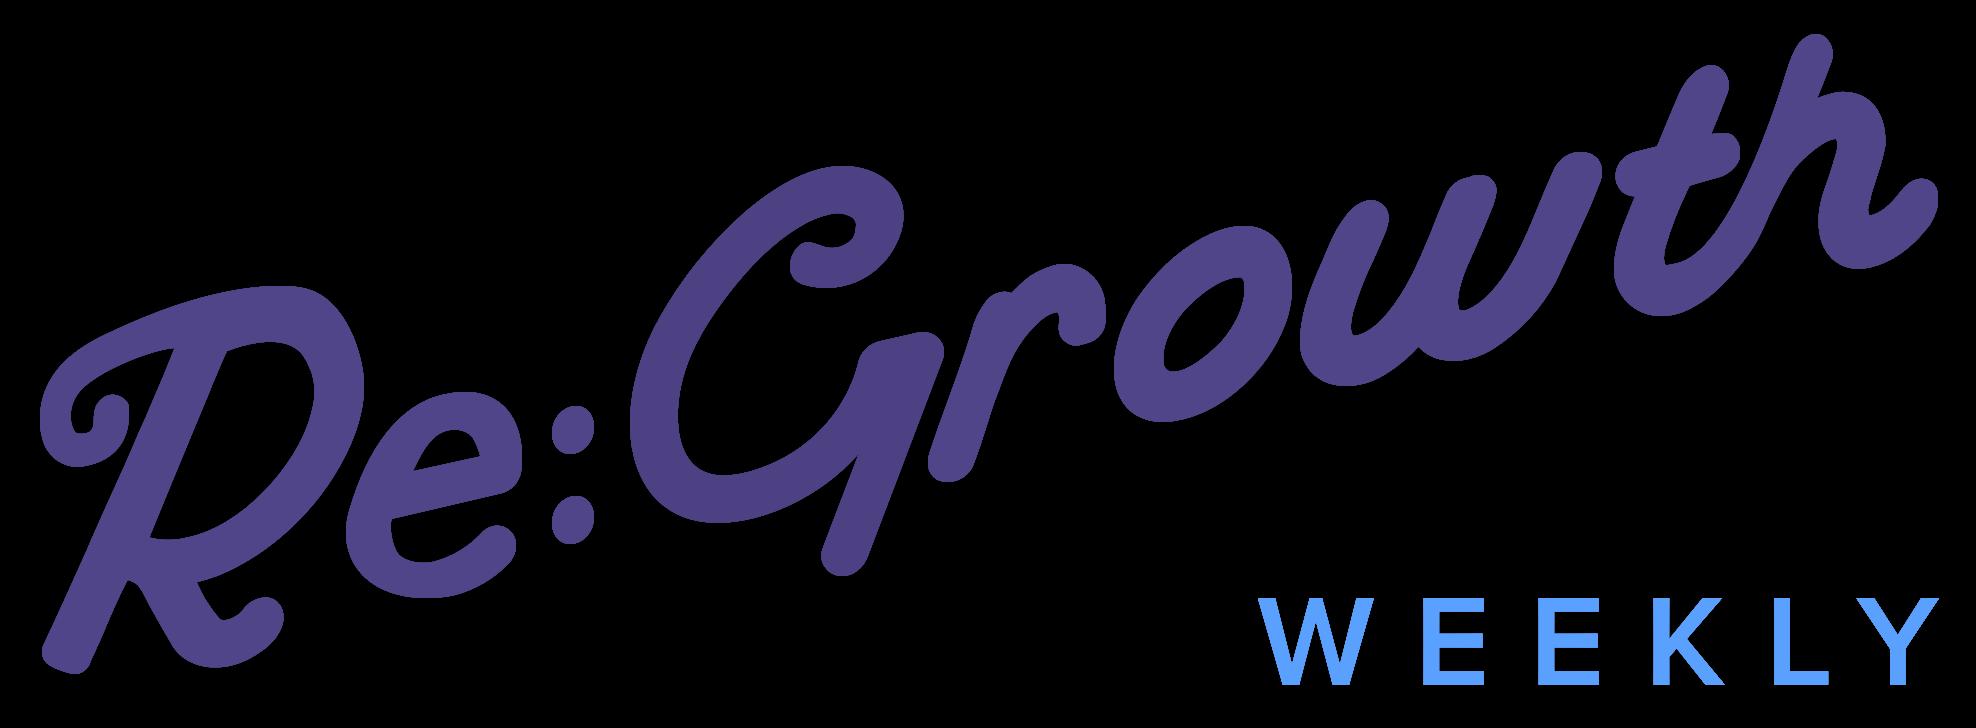 regrowth-weekly-logo-1-1